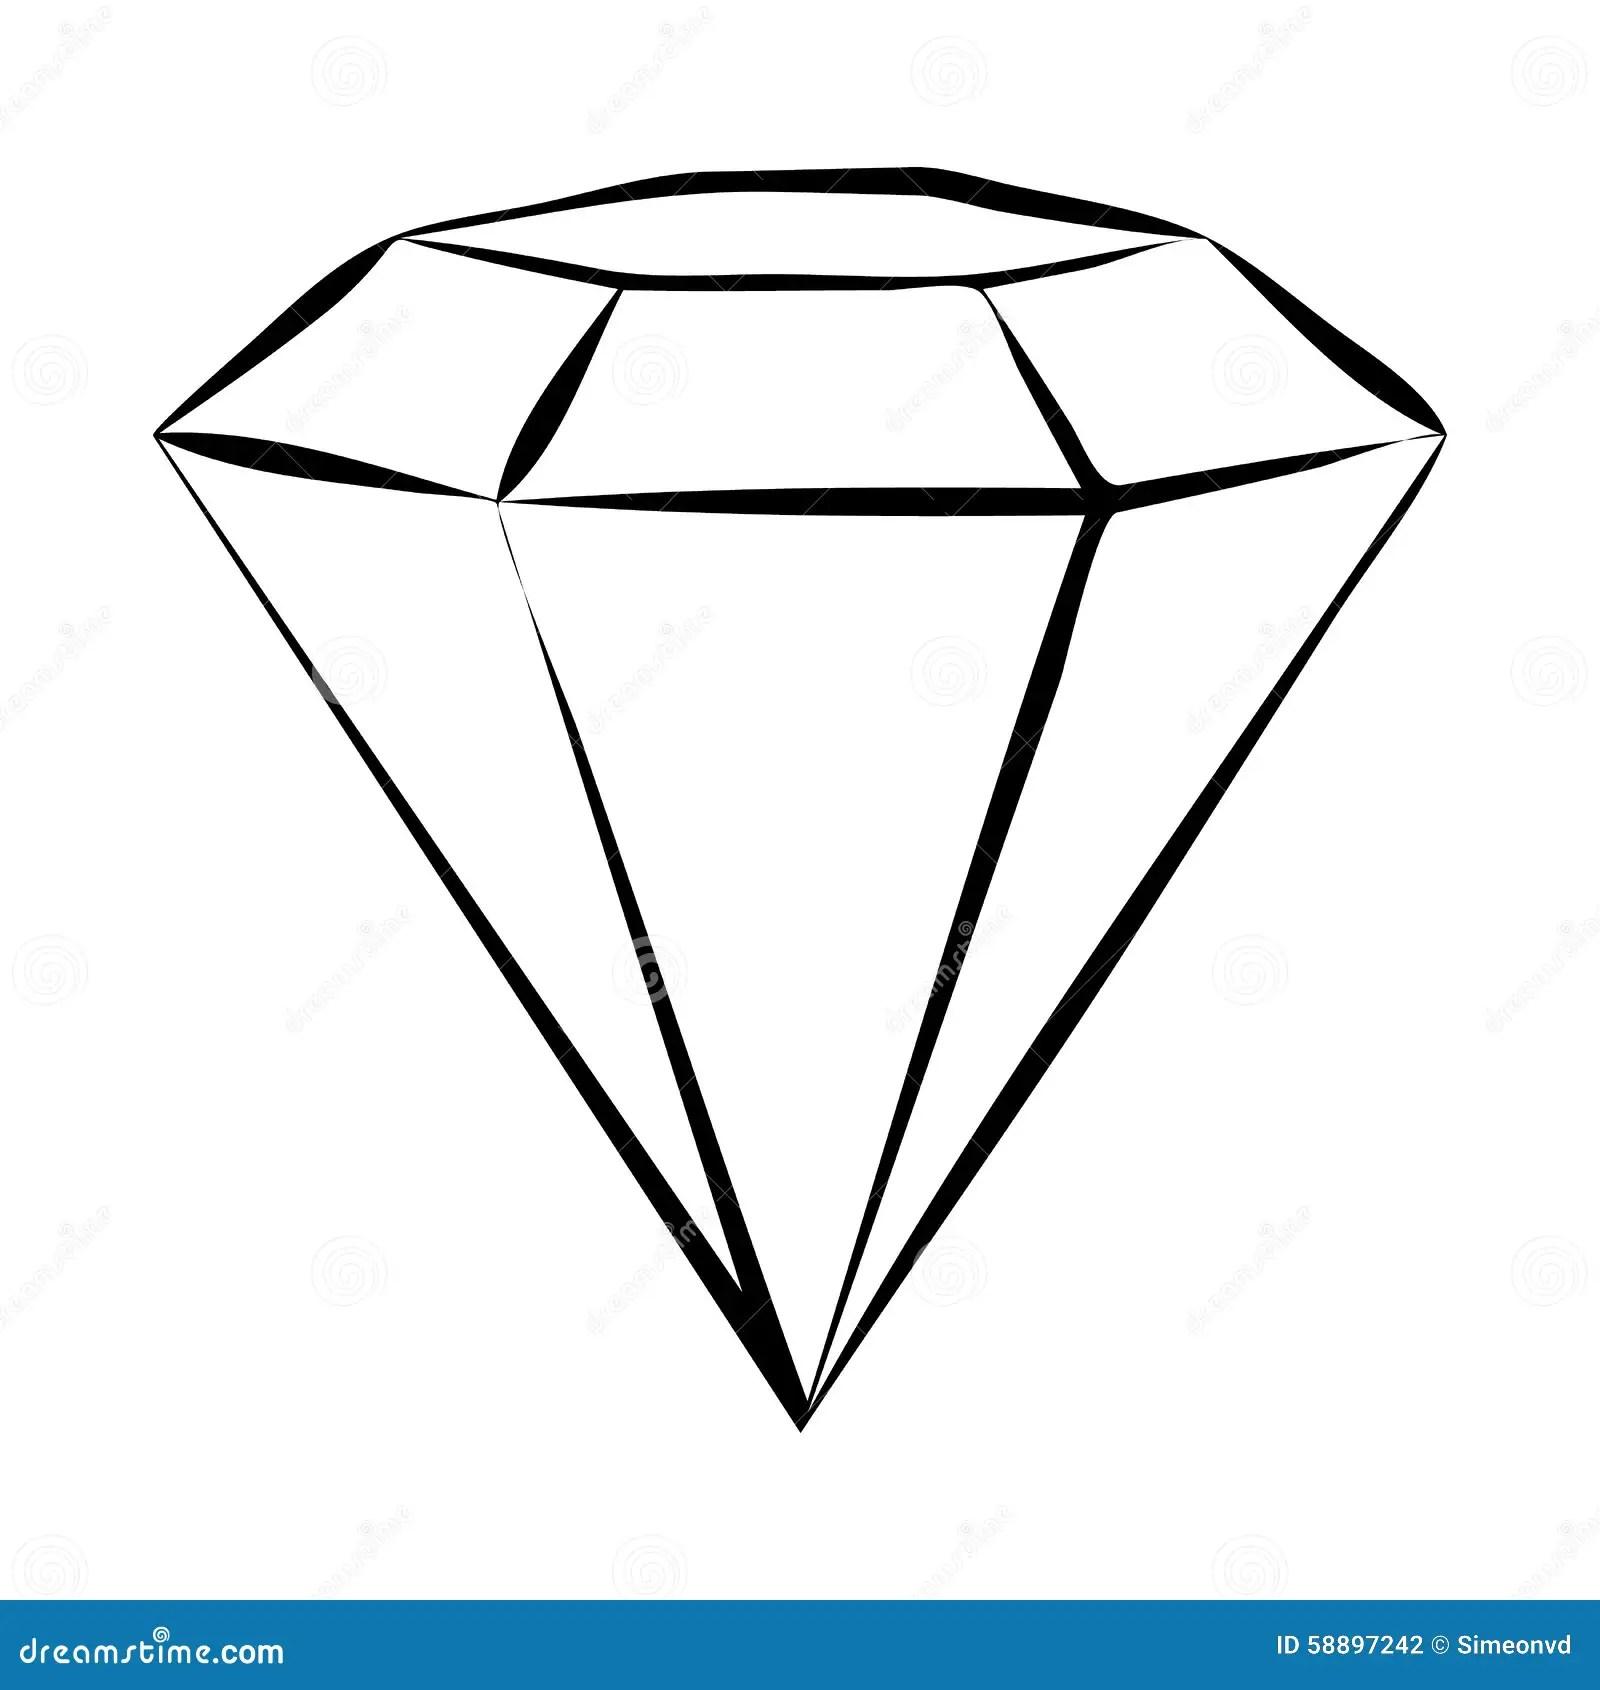 Diamond Skech Illustration De Vecteur Illustration Du